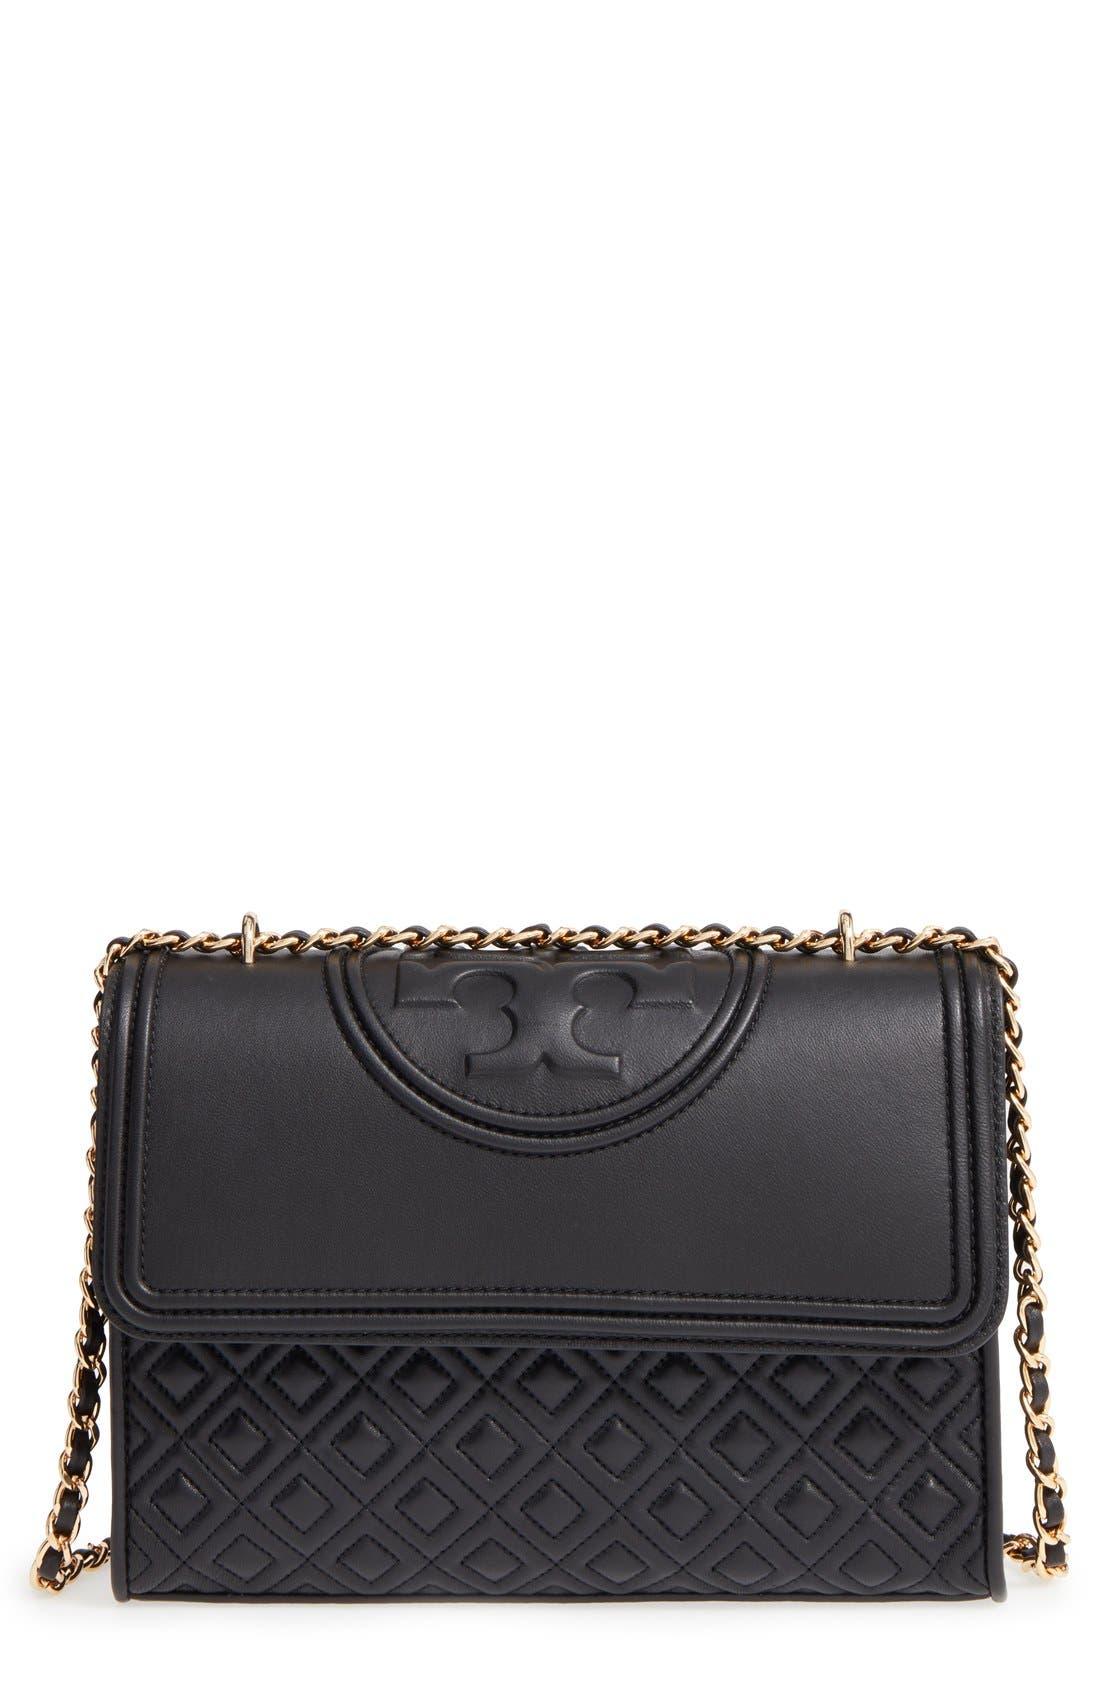 'Fleming' Convertible Shoulder Bag,                             Main thumbnail 1, color,                             BLACK